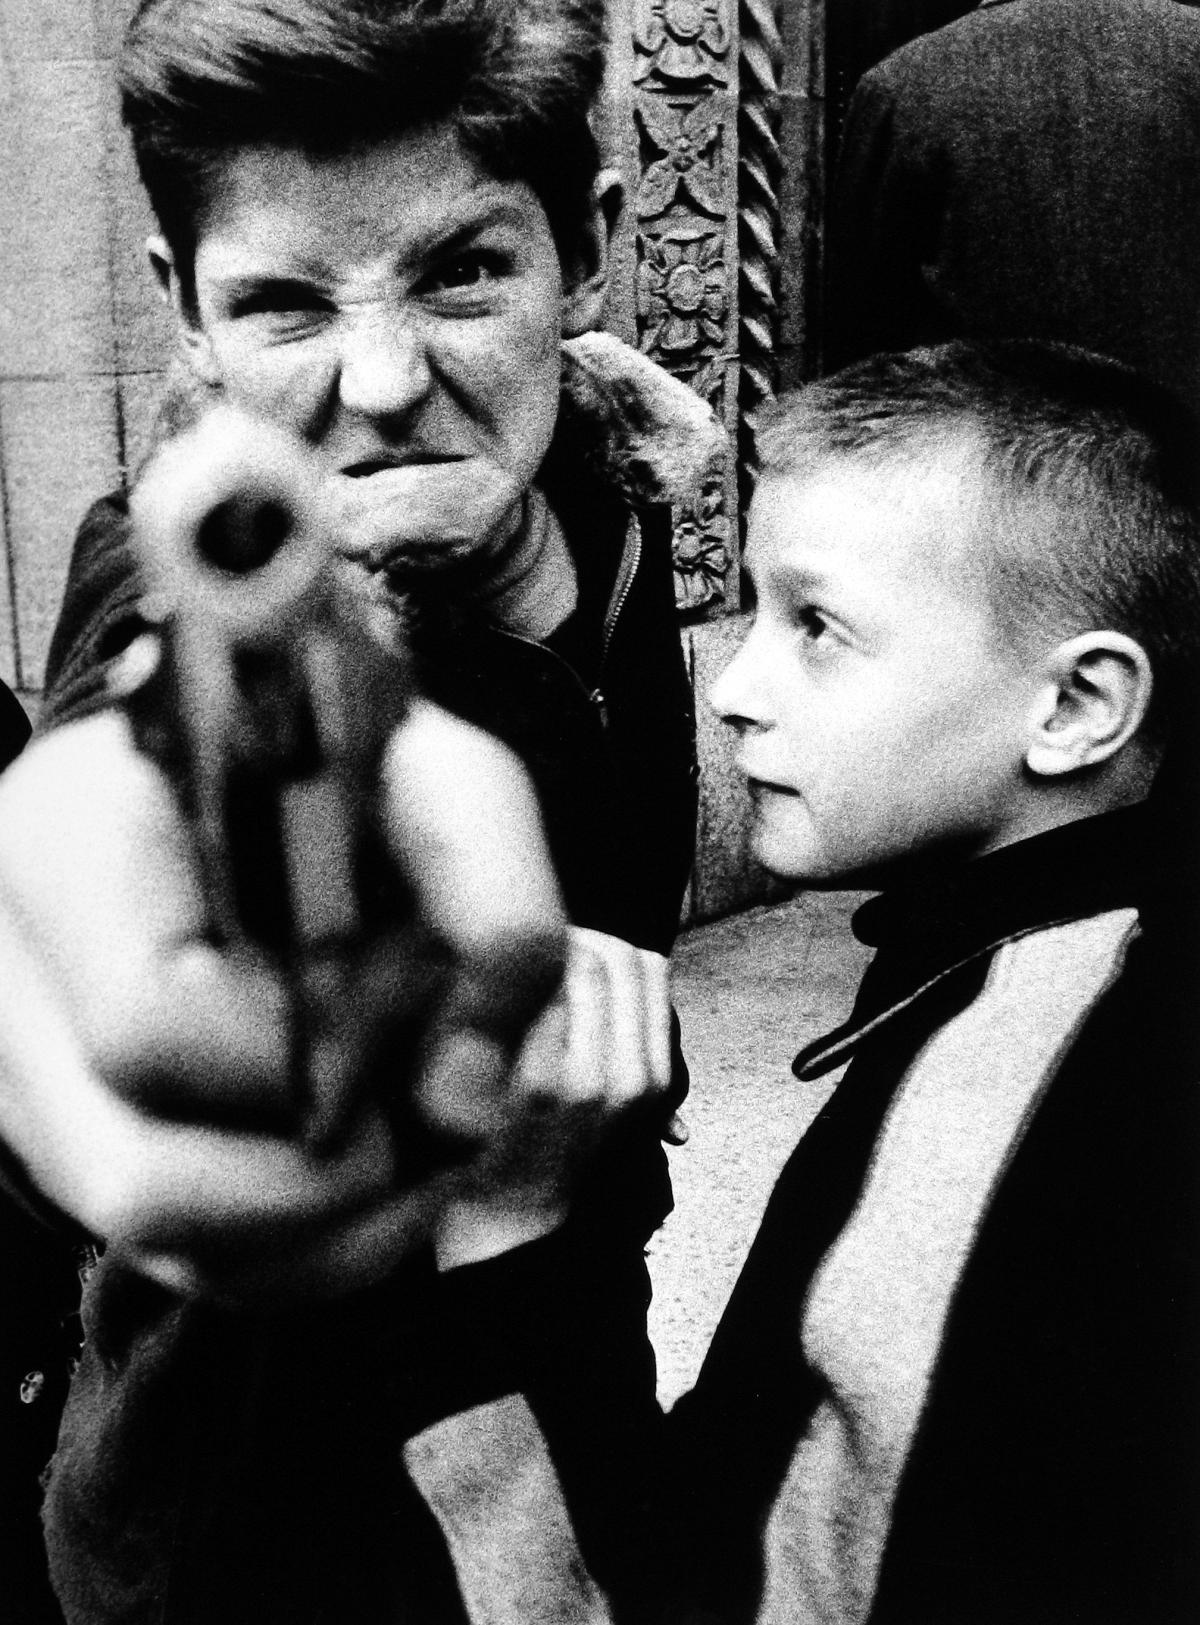 Gun 1, New York, 1955